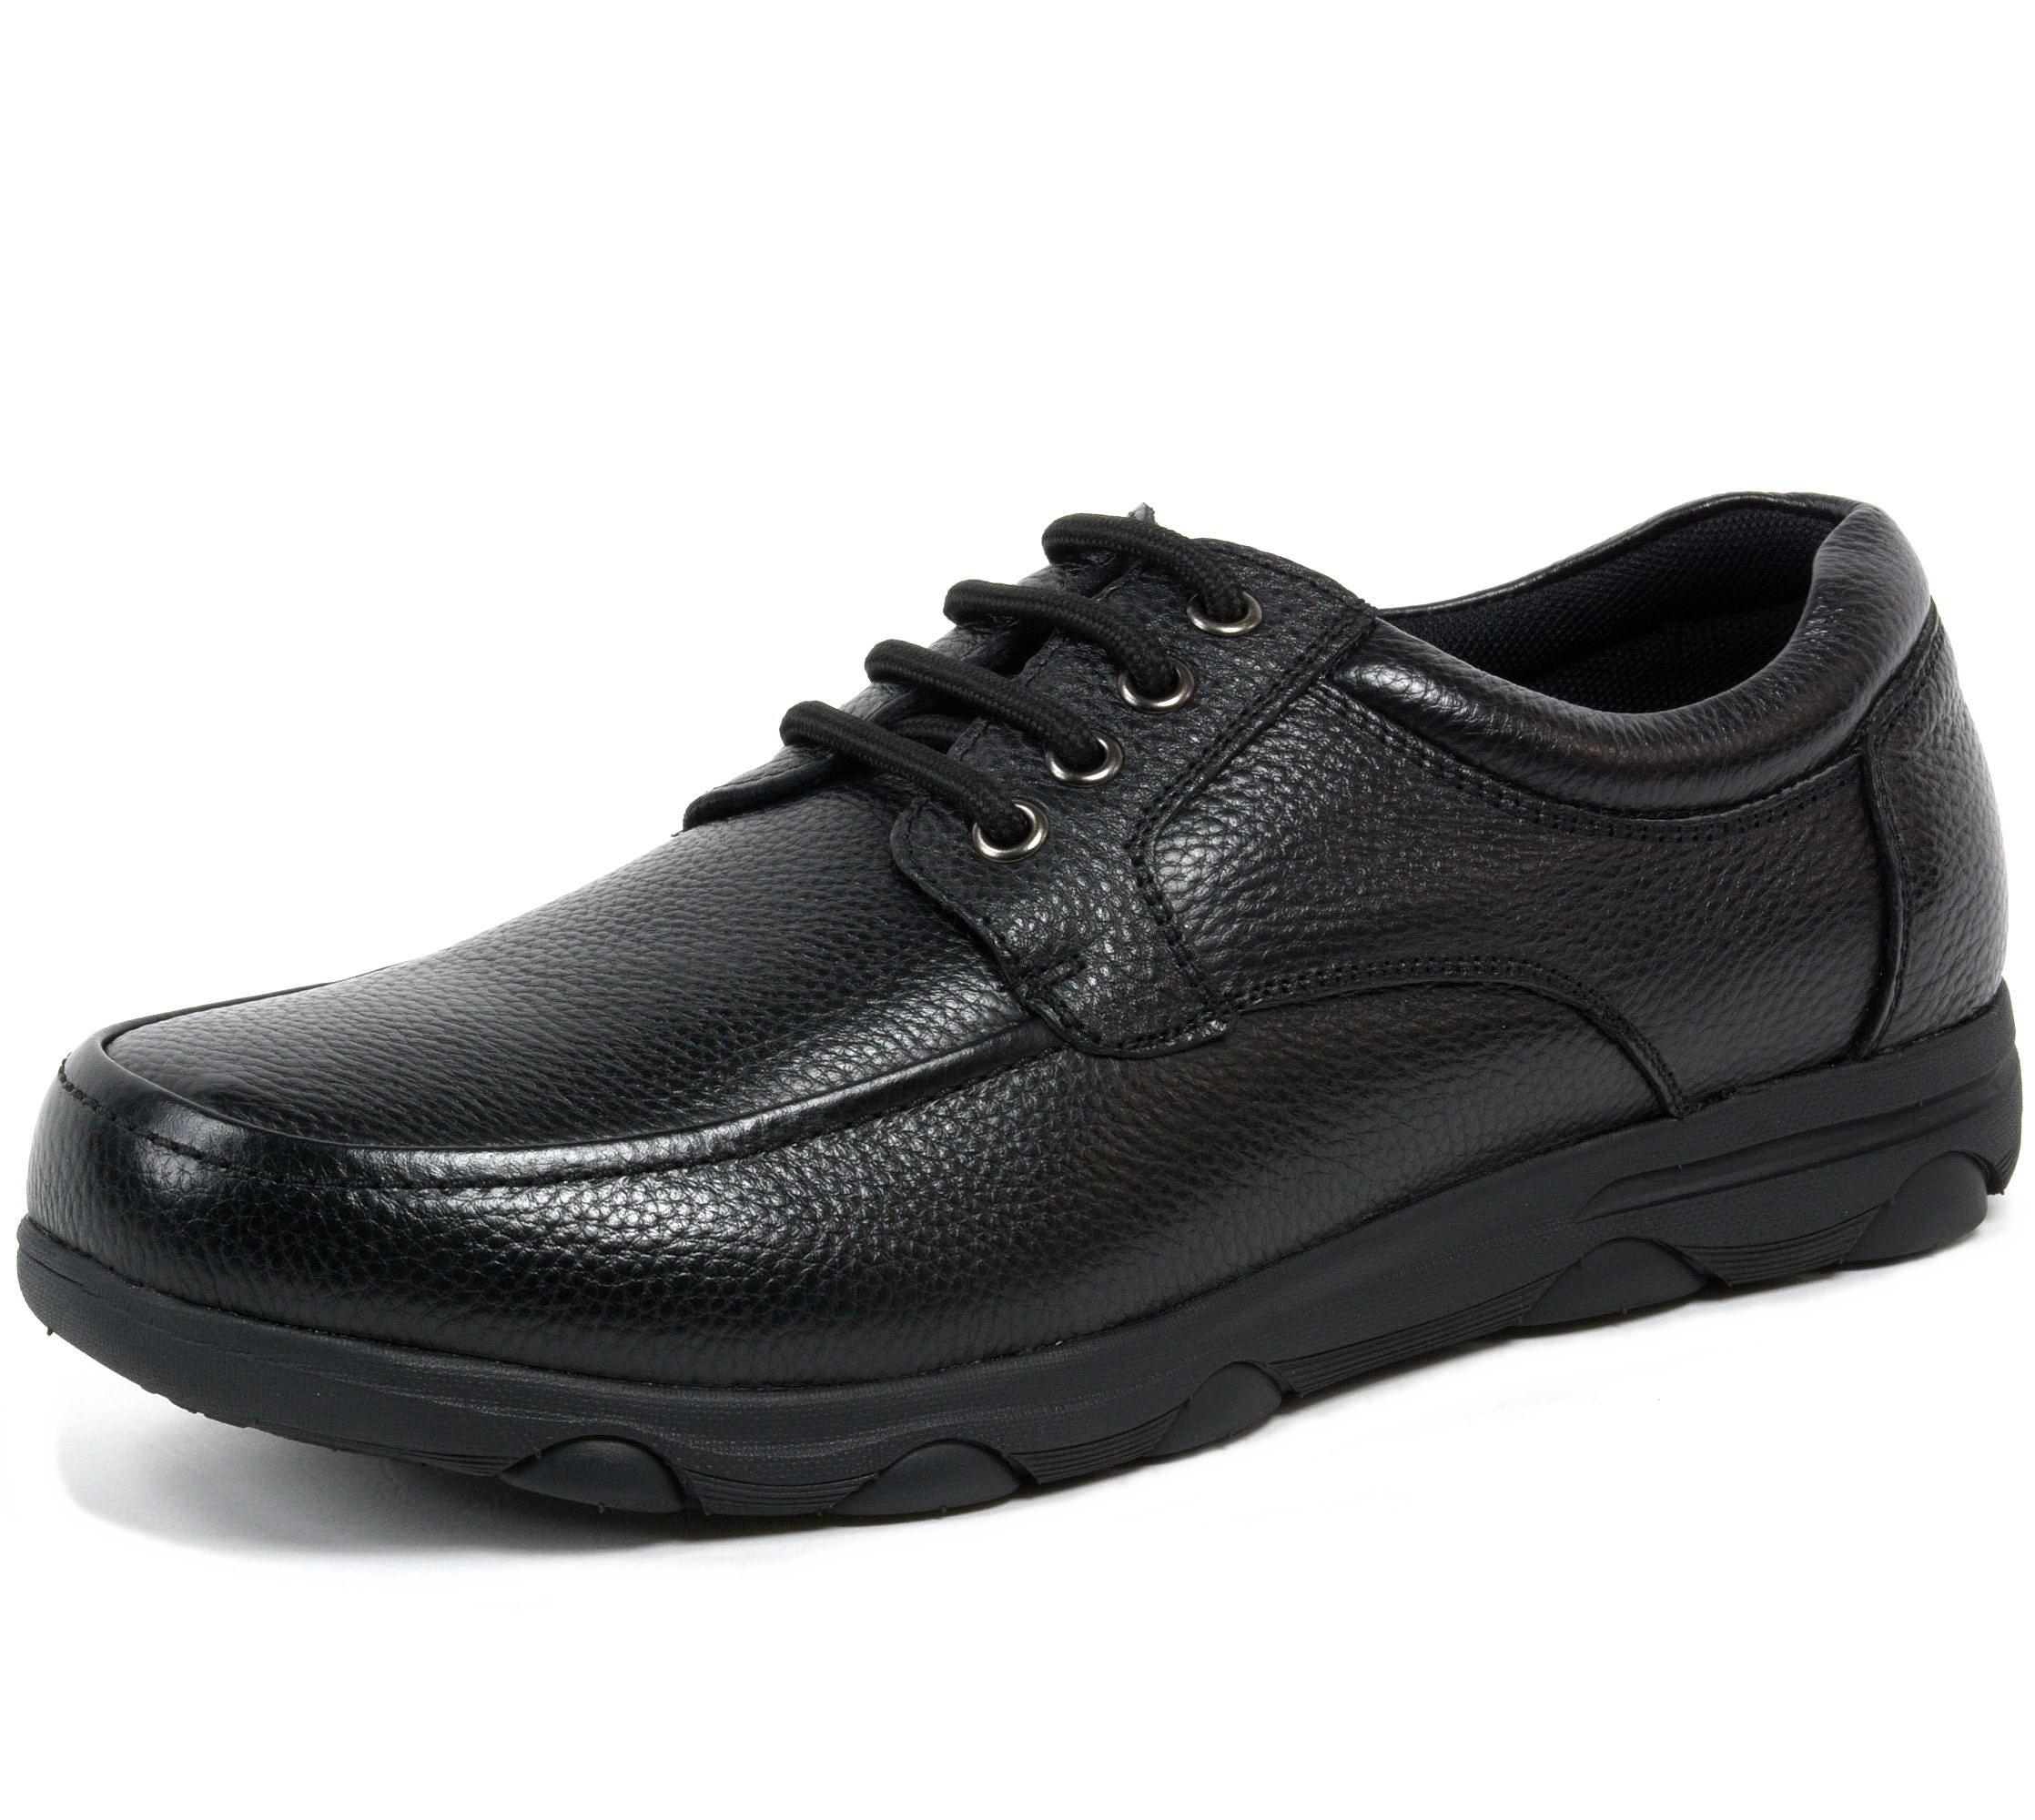 alpine swiss garson mens leather work shoes slip